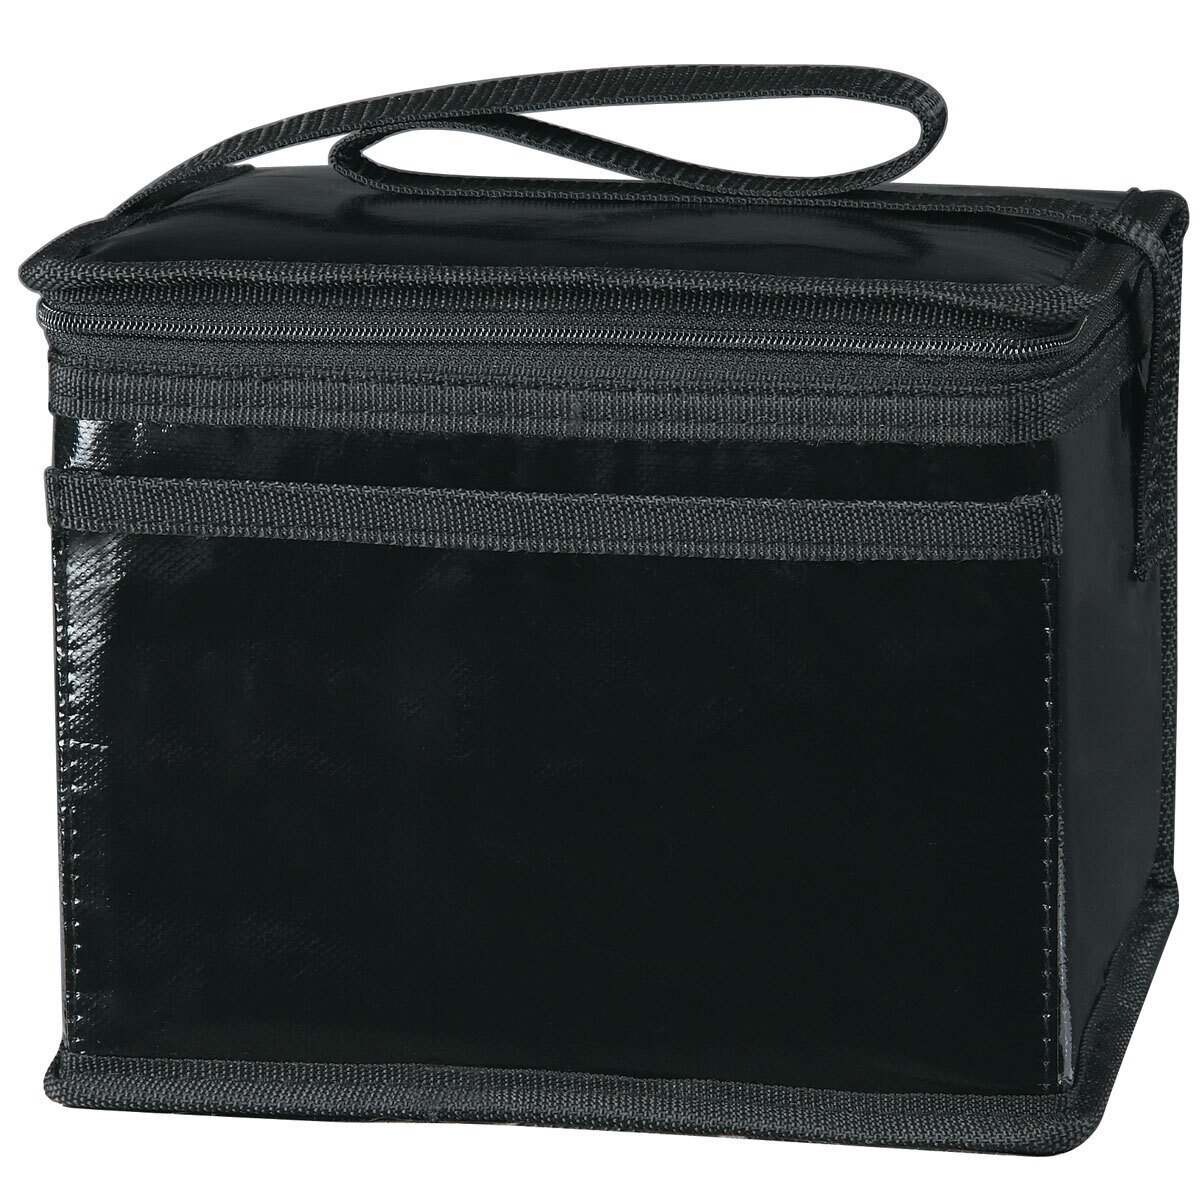 Laminated Non-Woven Six Pack Kooler Bag